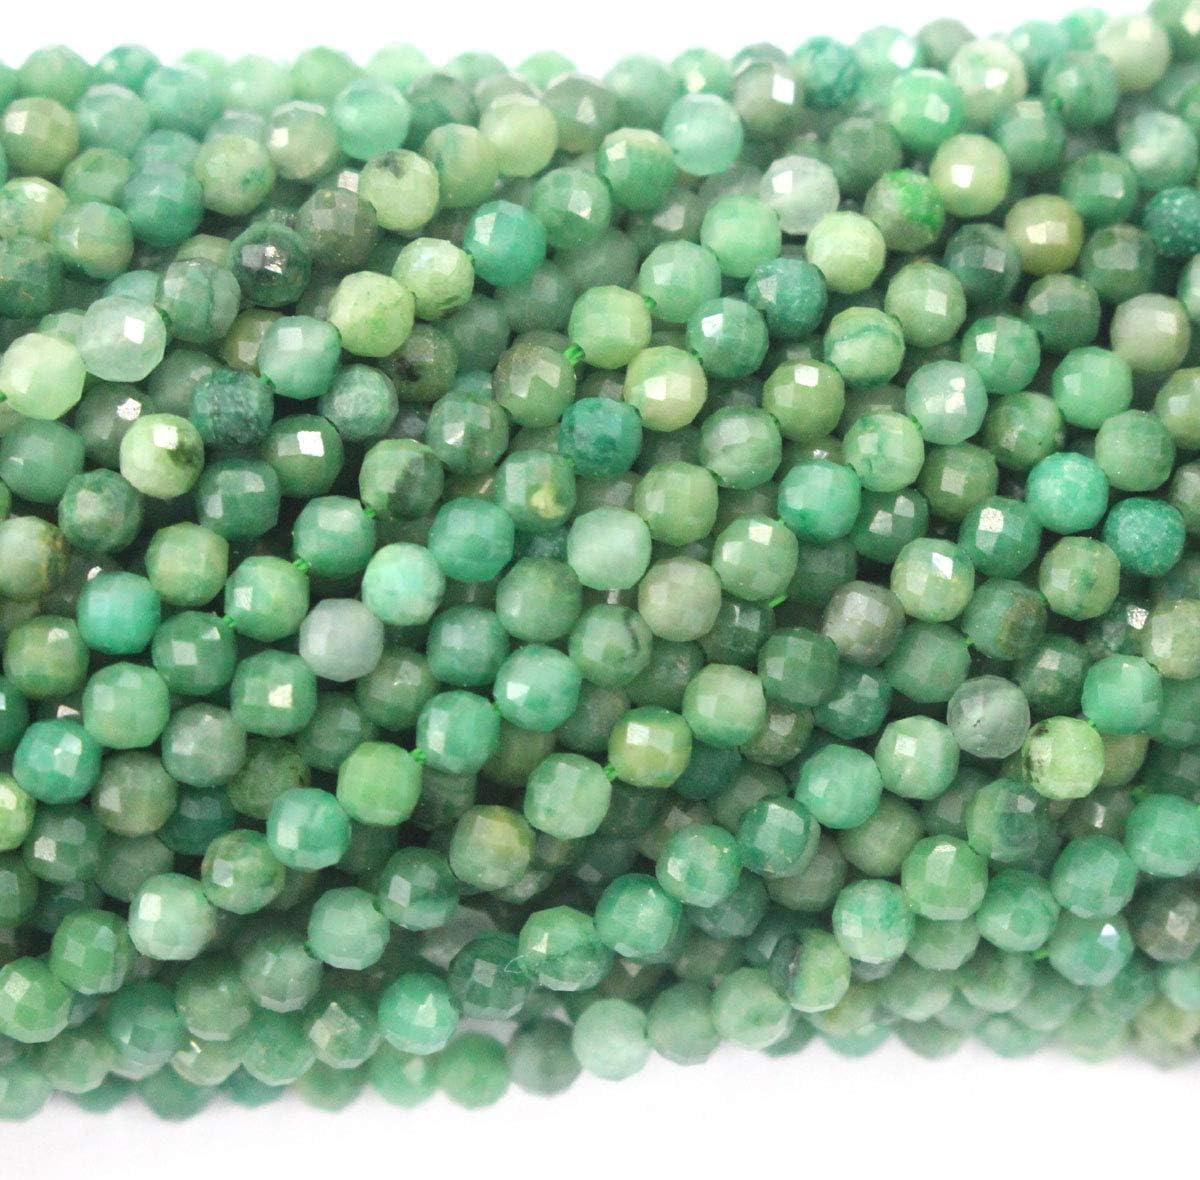 Natural 12mm 15.5 inches African jade smooth round beads Genuine Gemstone